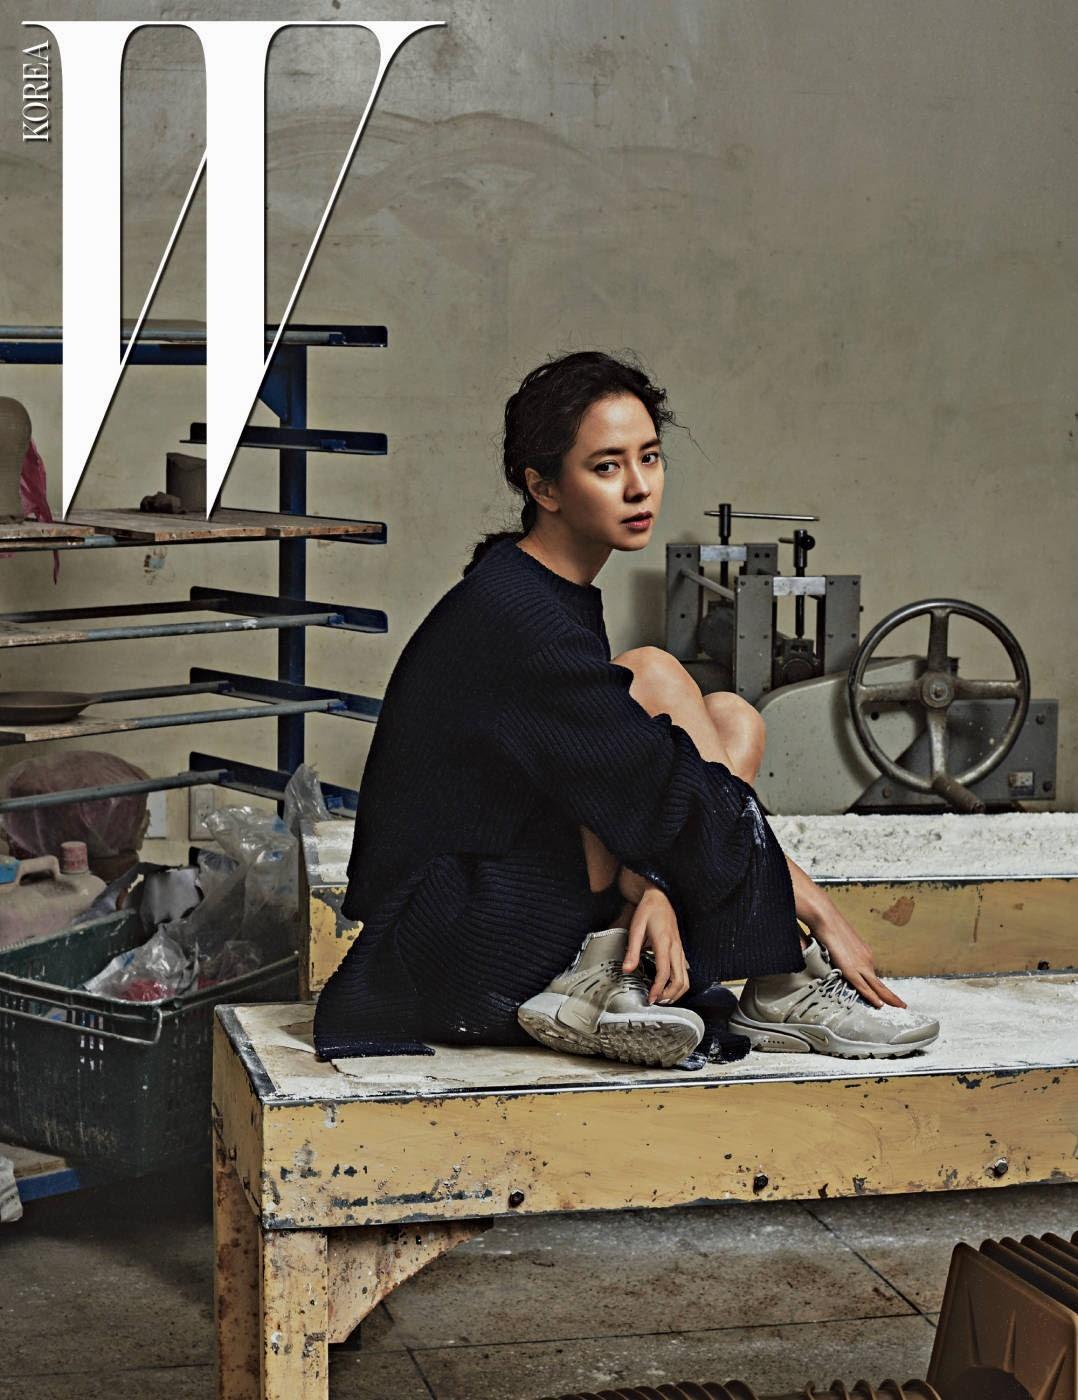 Song Ji Hyo - W Magazine January Issue '17